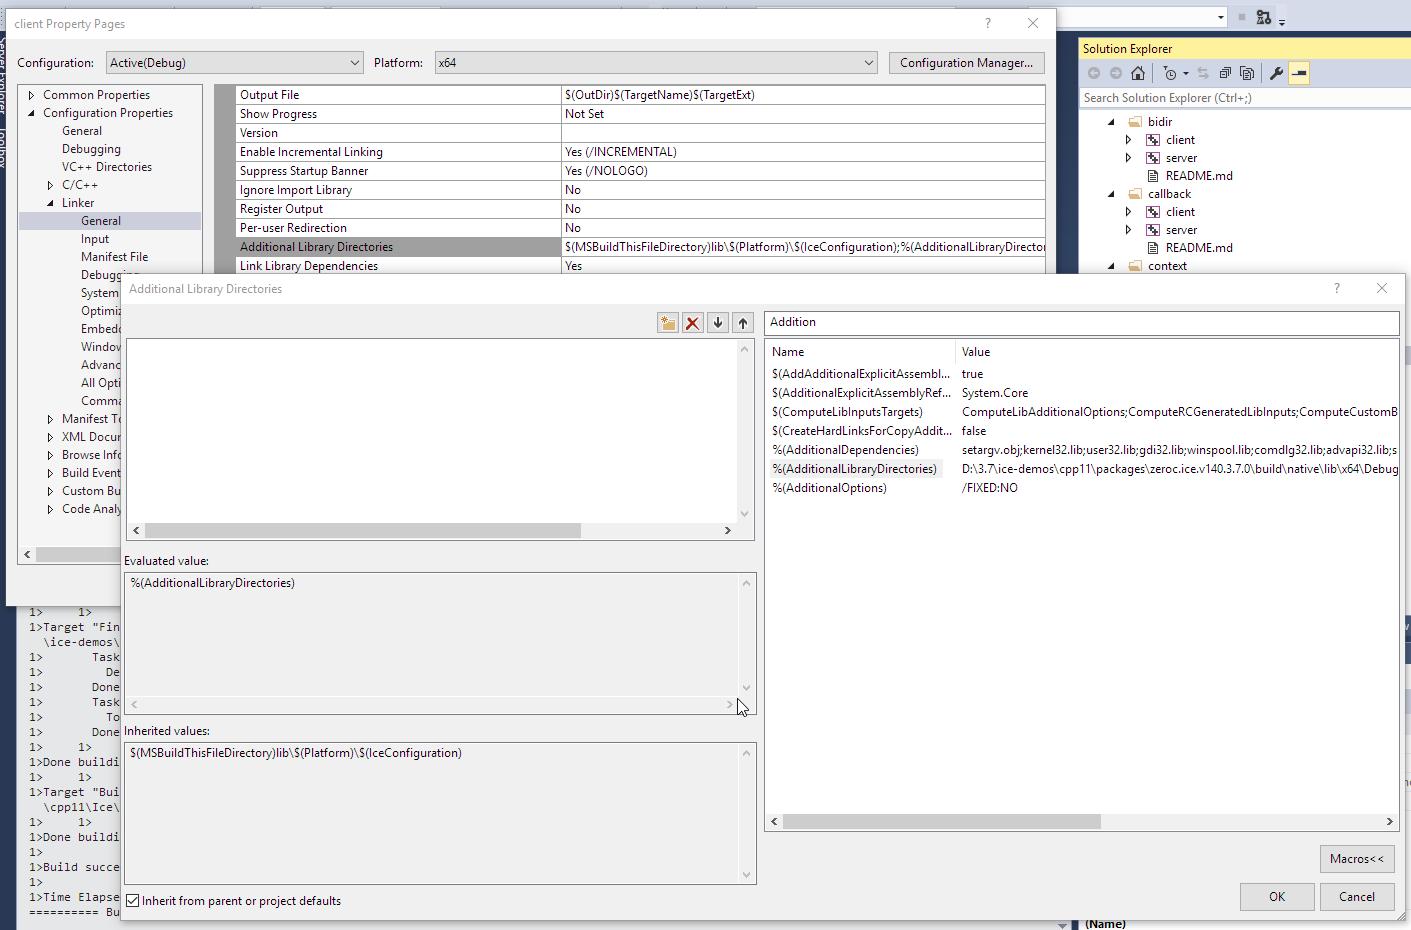 Error with Visual Studio 2015 using nuget package in debug